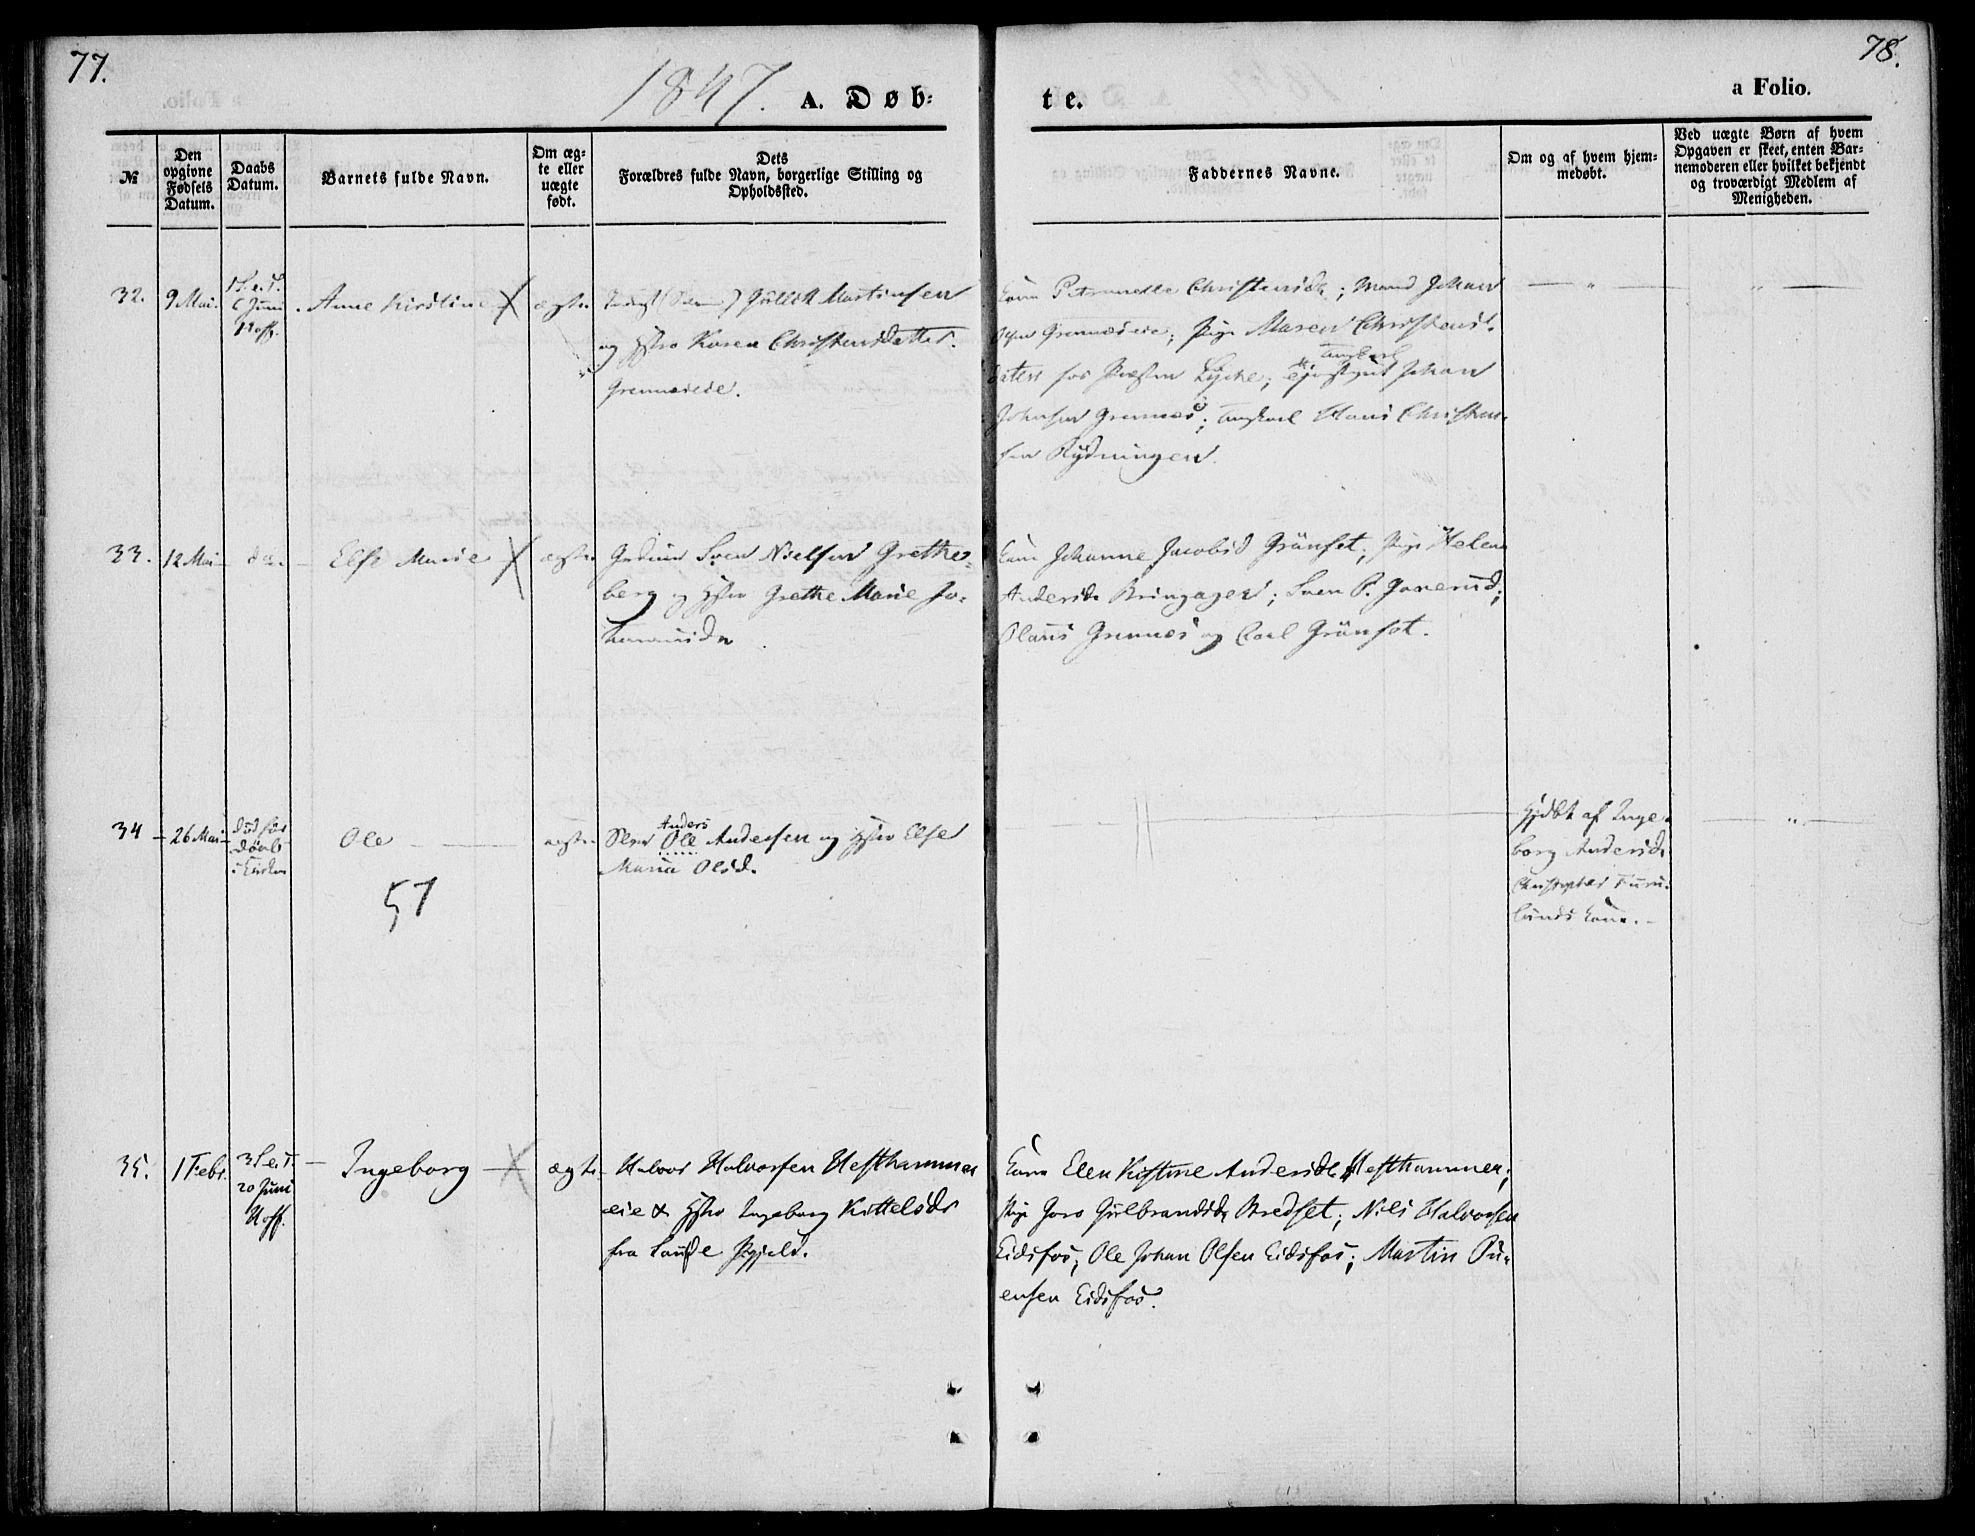 SAKO, Hof kirkebøker, F/Fa/L0005: Ministerialbok nr. I 5, 1844-1851, s. 77-78